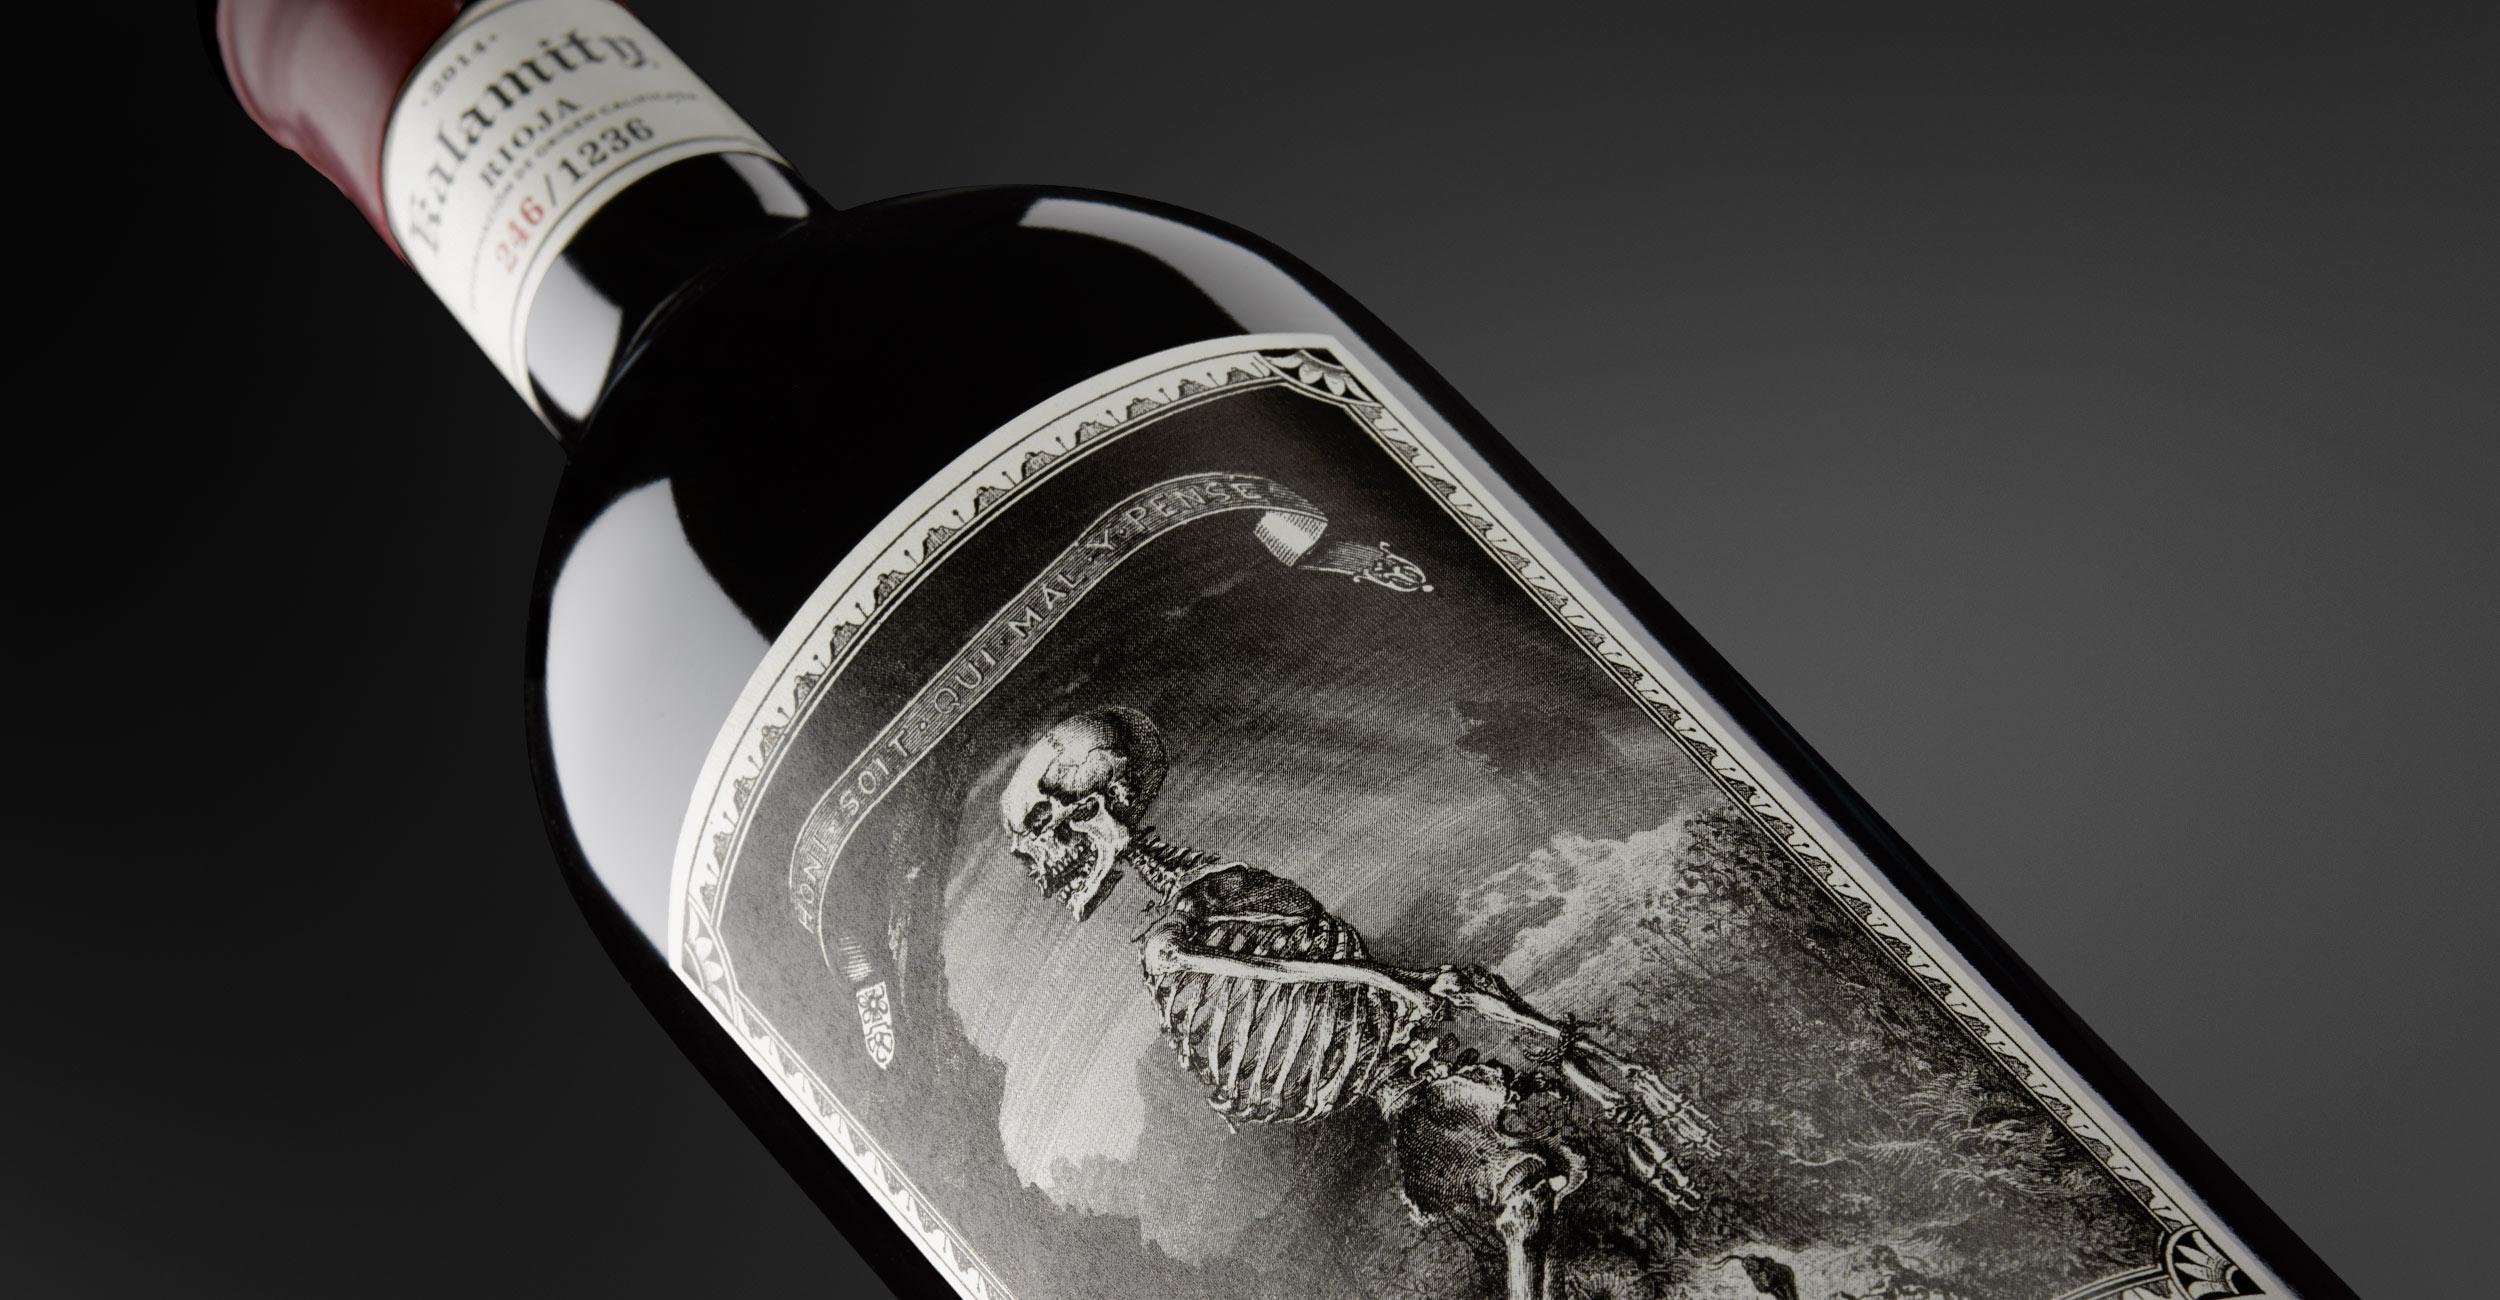 Oxer Wines - Kalamity